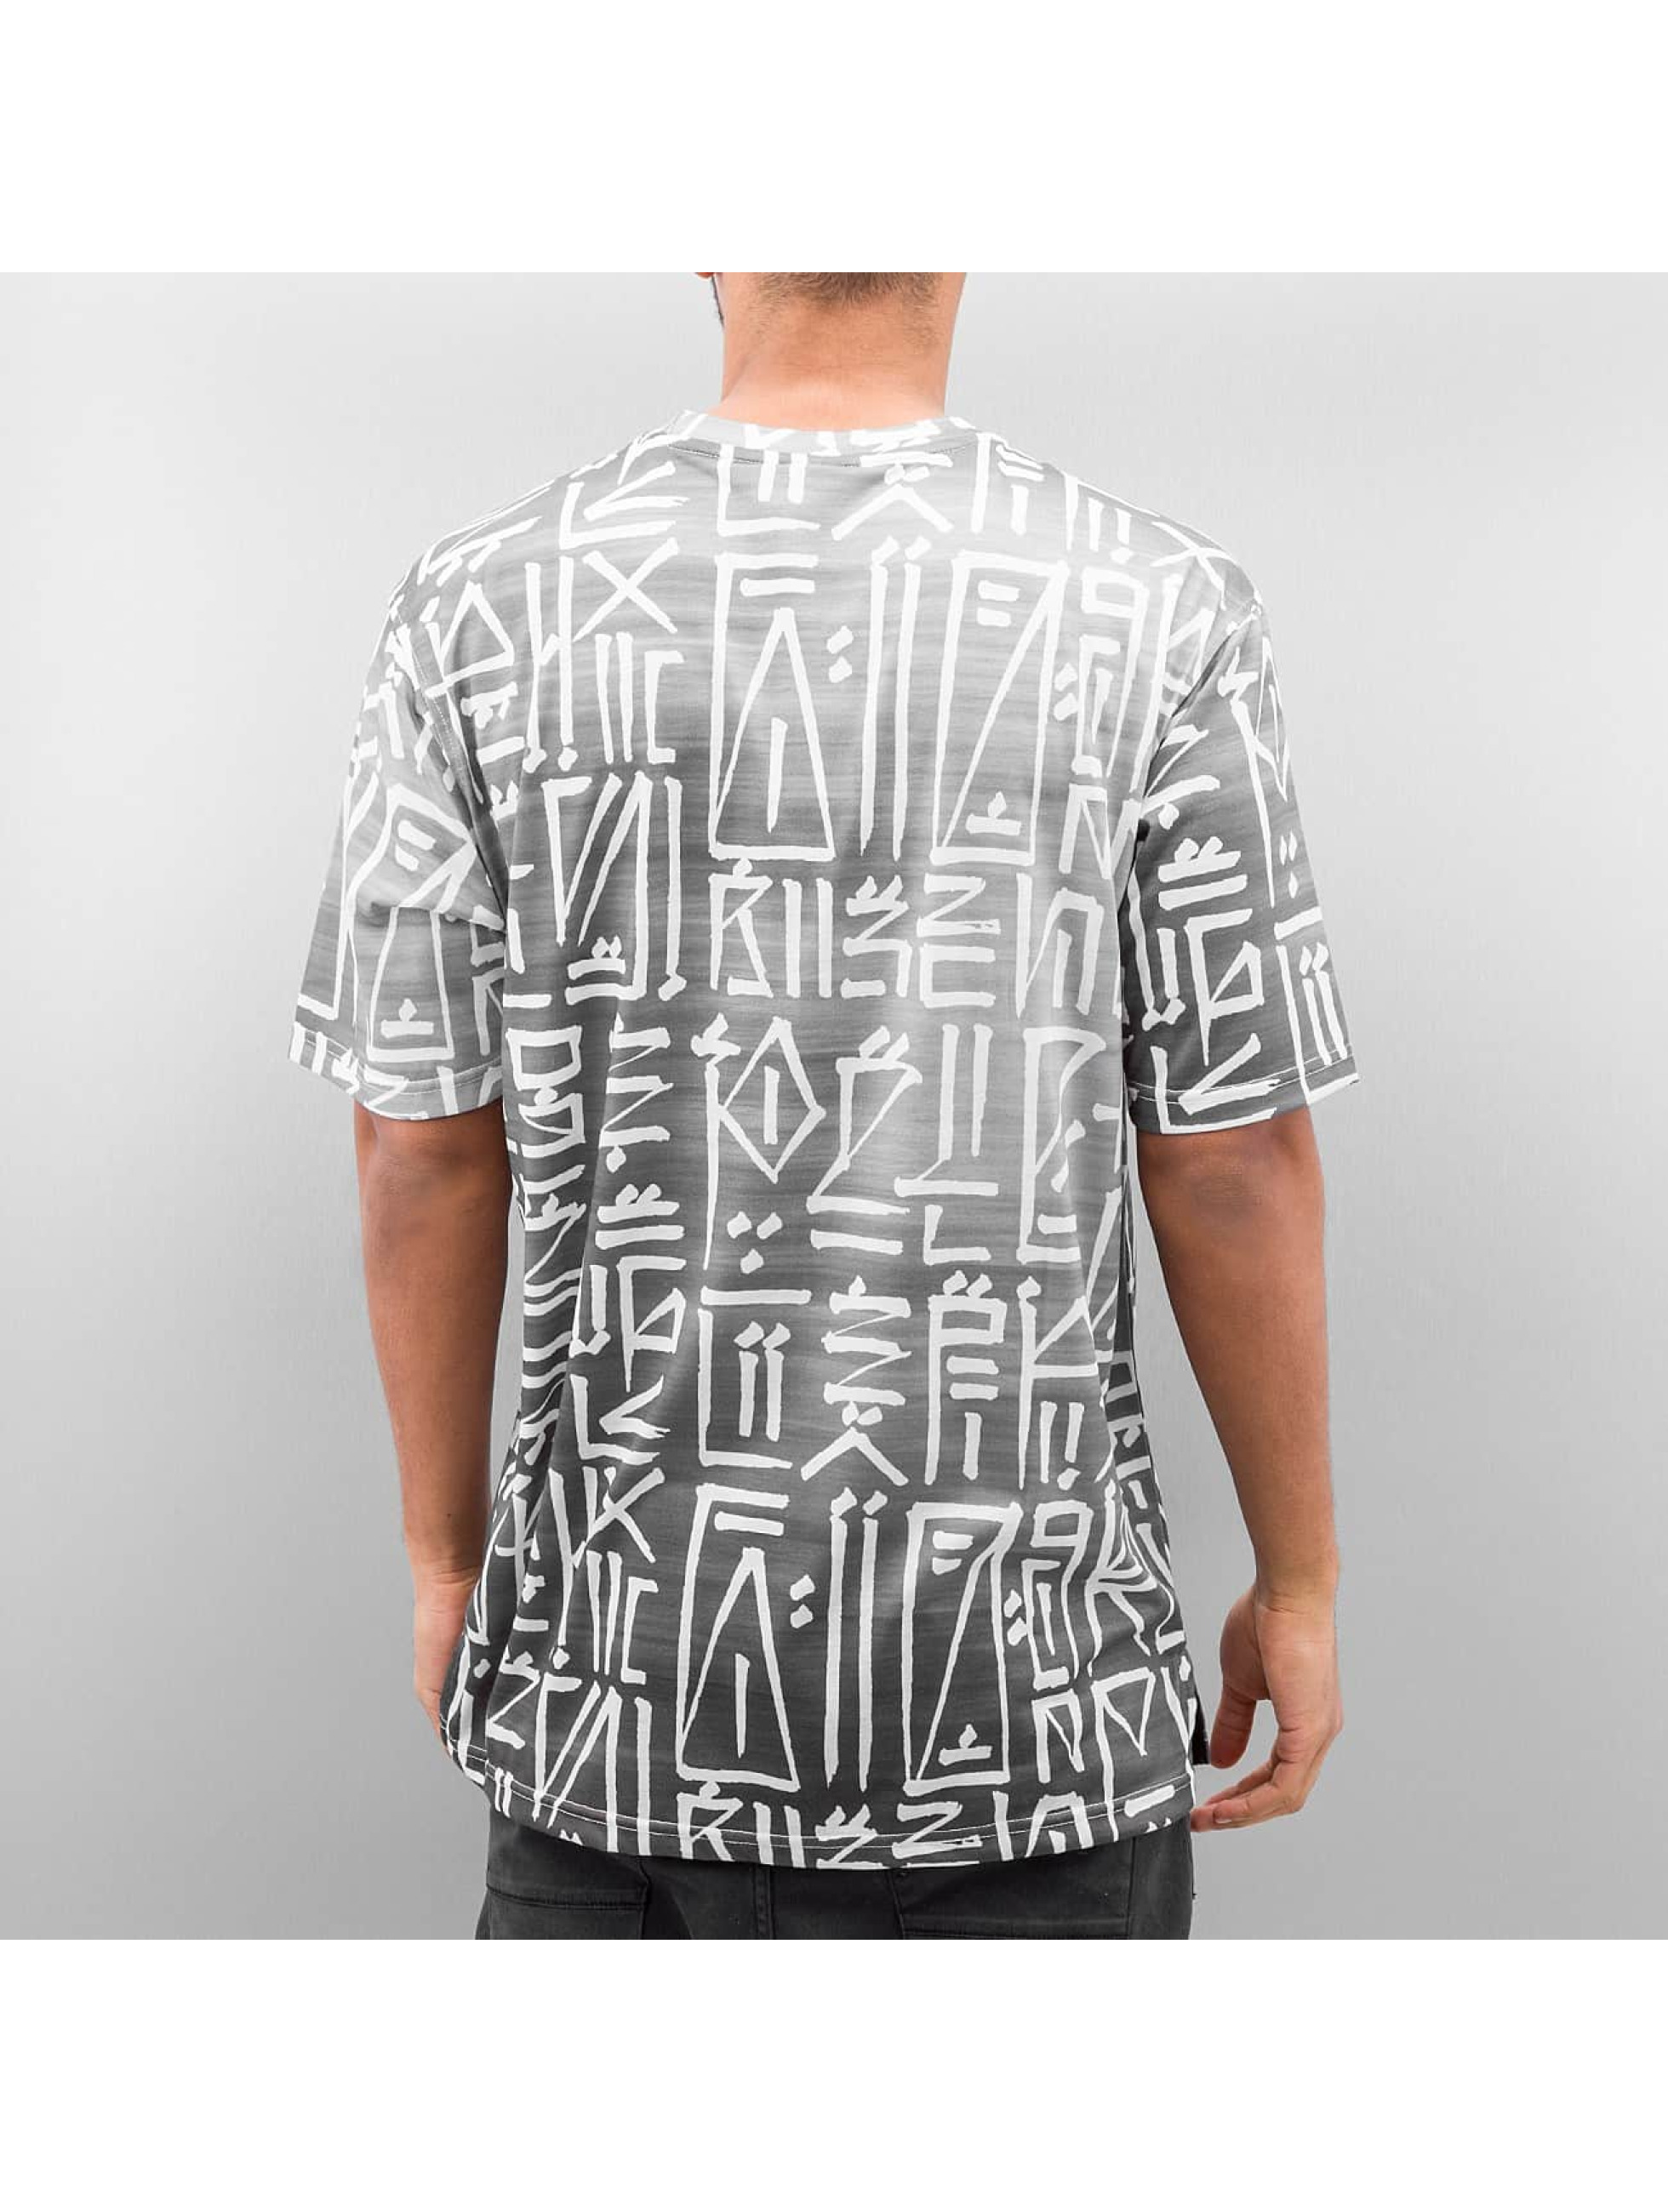 Pelle Pelle t-shirt The Abstract grijs